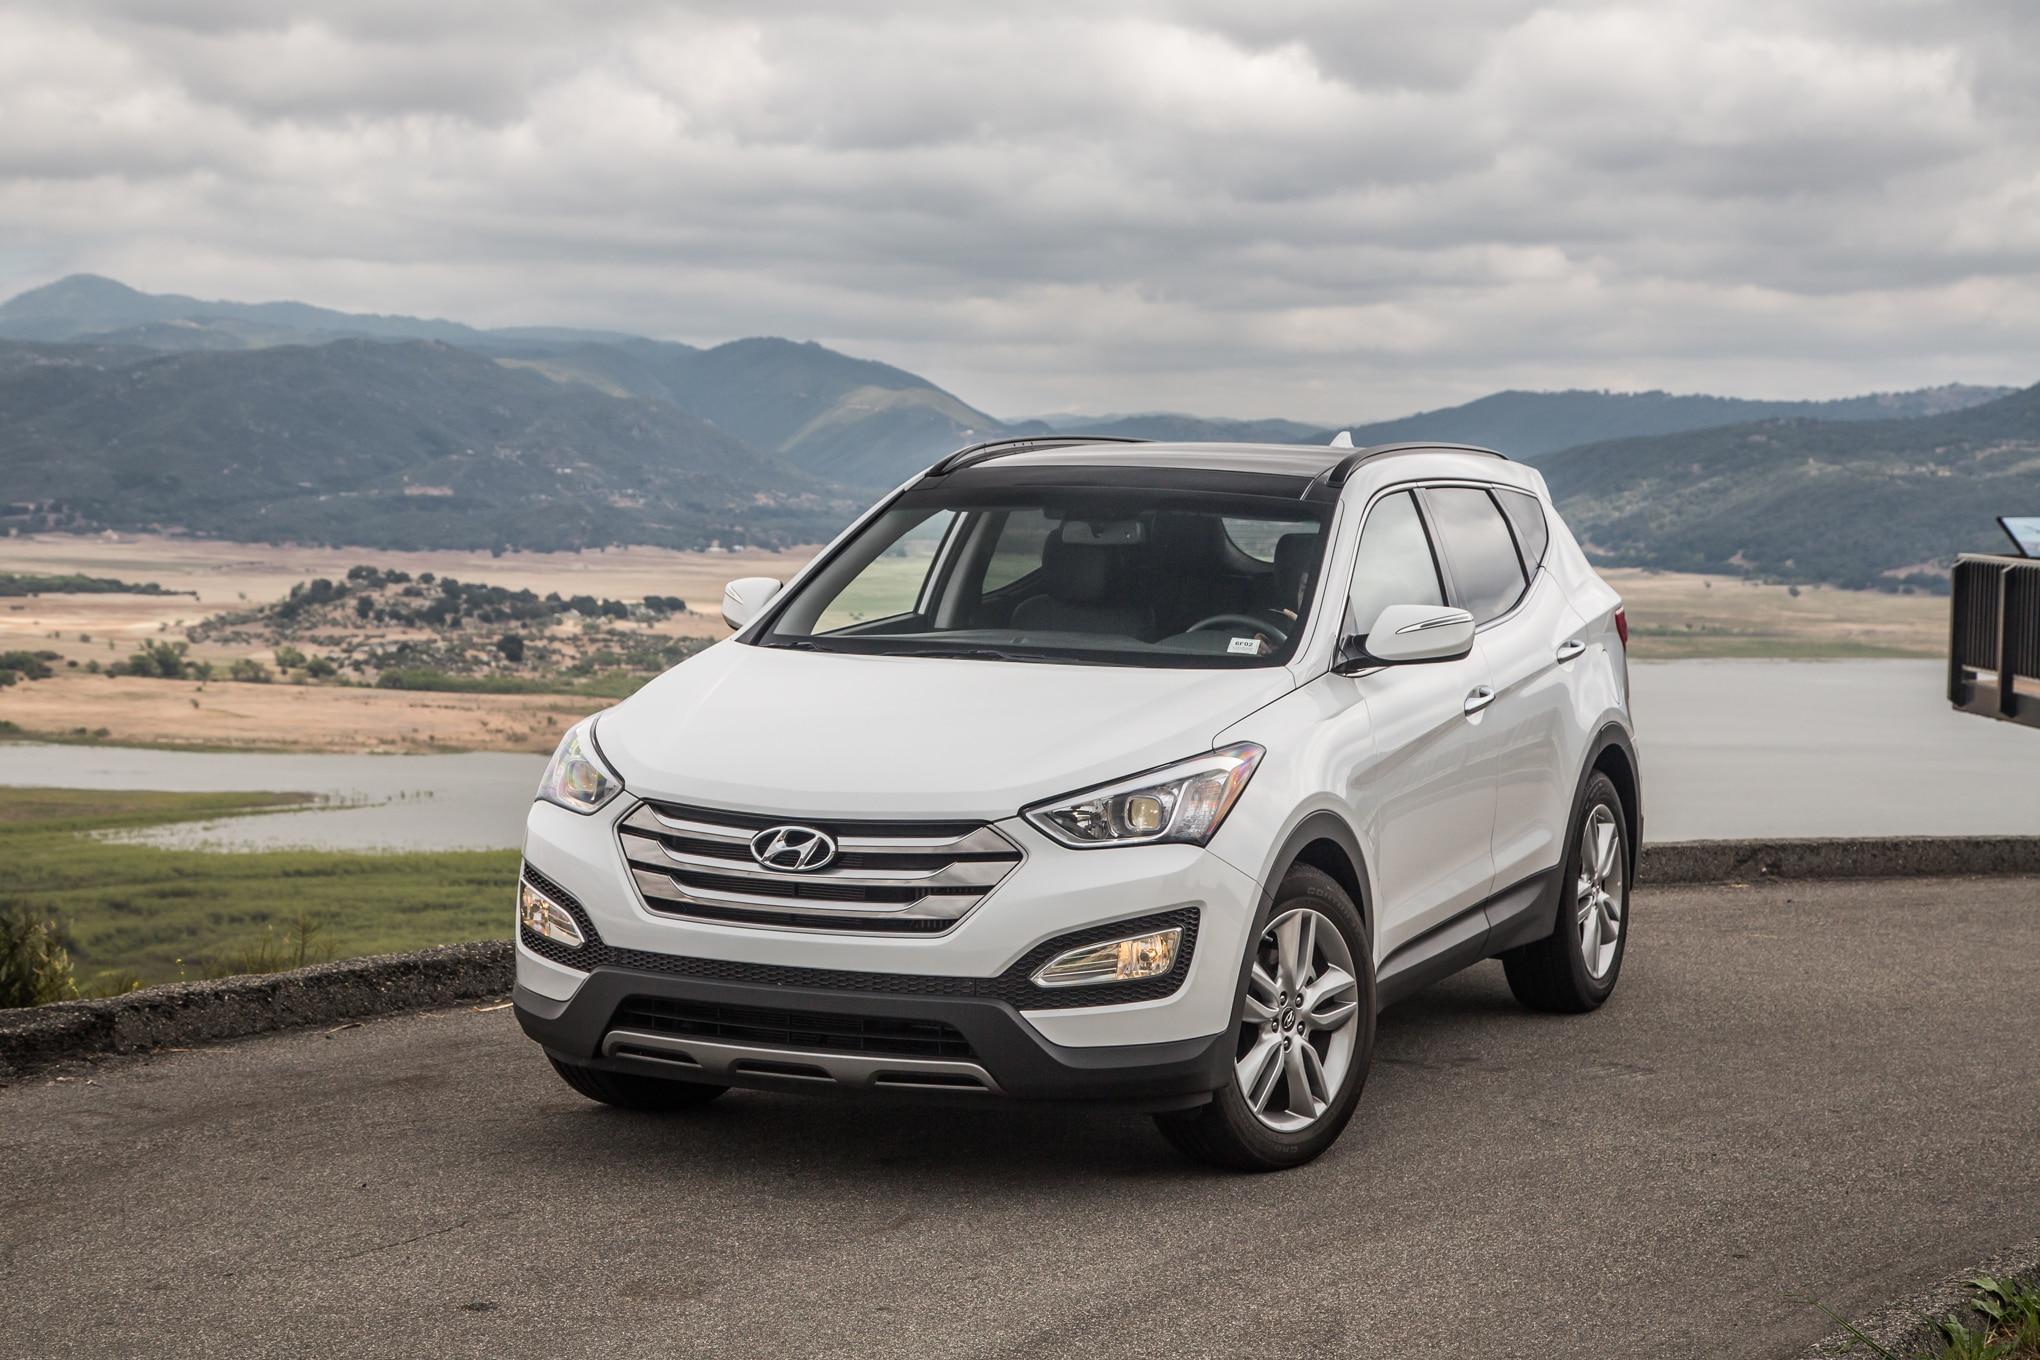 Comparativa Ford Edge Vs Nissan Murano Vs Hyundai Santa